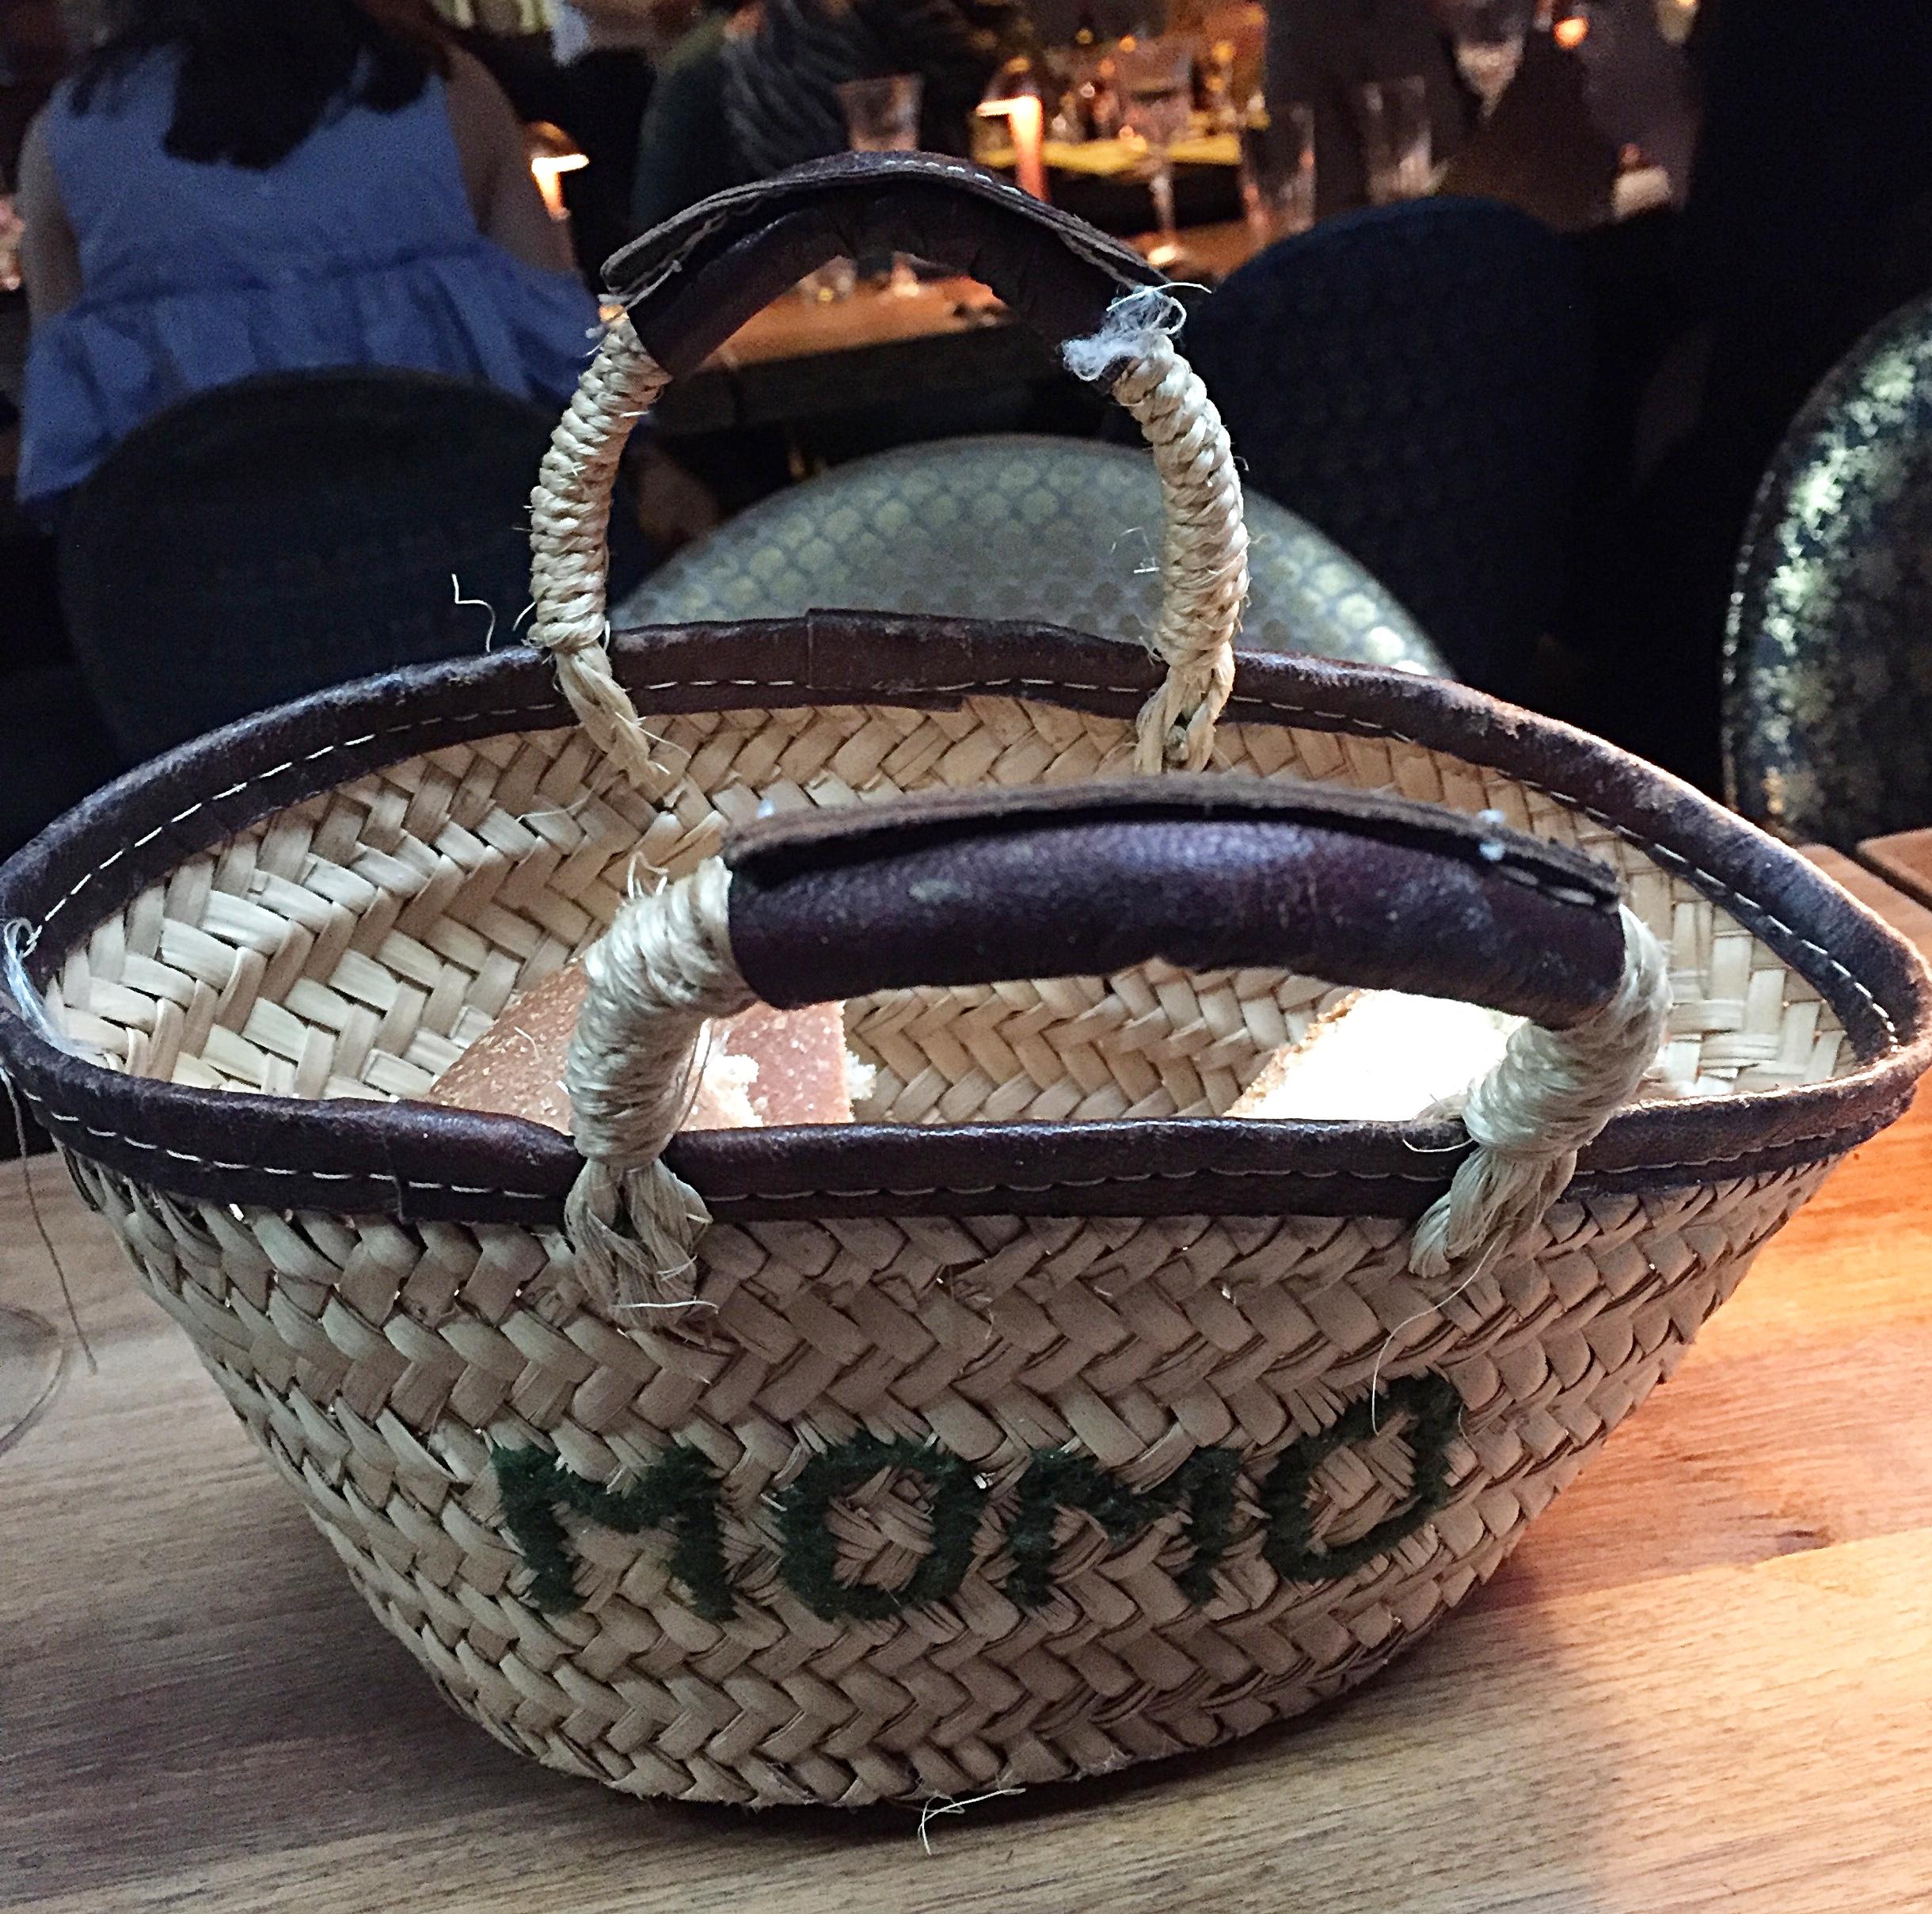 Bread basket - Momo restaurant review, Mayfair London